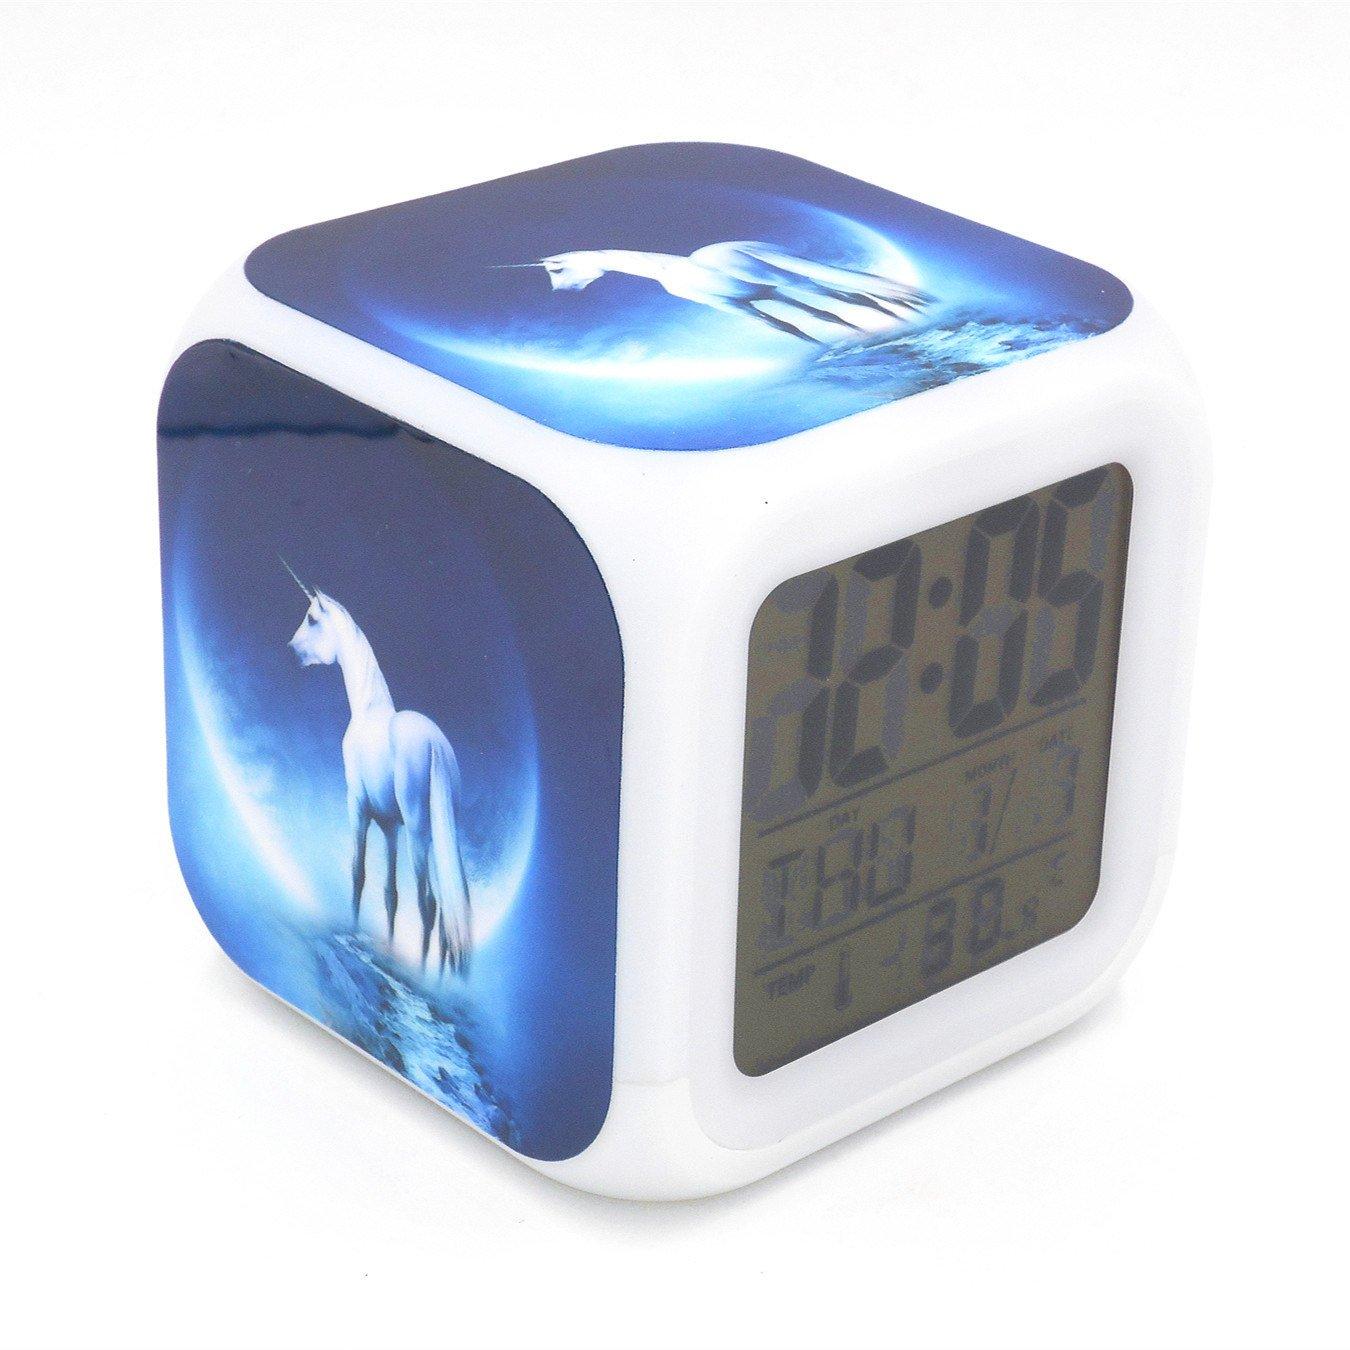 Boyan New Unicorn Moon Blue Led Alarm Clock Creative Desk Table Clock Multipurpose Calendar Snooze Glowing Led Digital Alarm Clock for Unisex Adults Kids Toy Gift